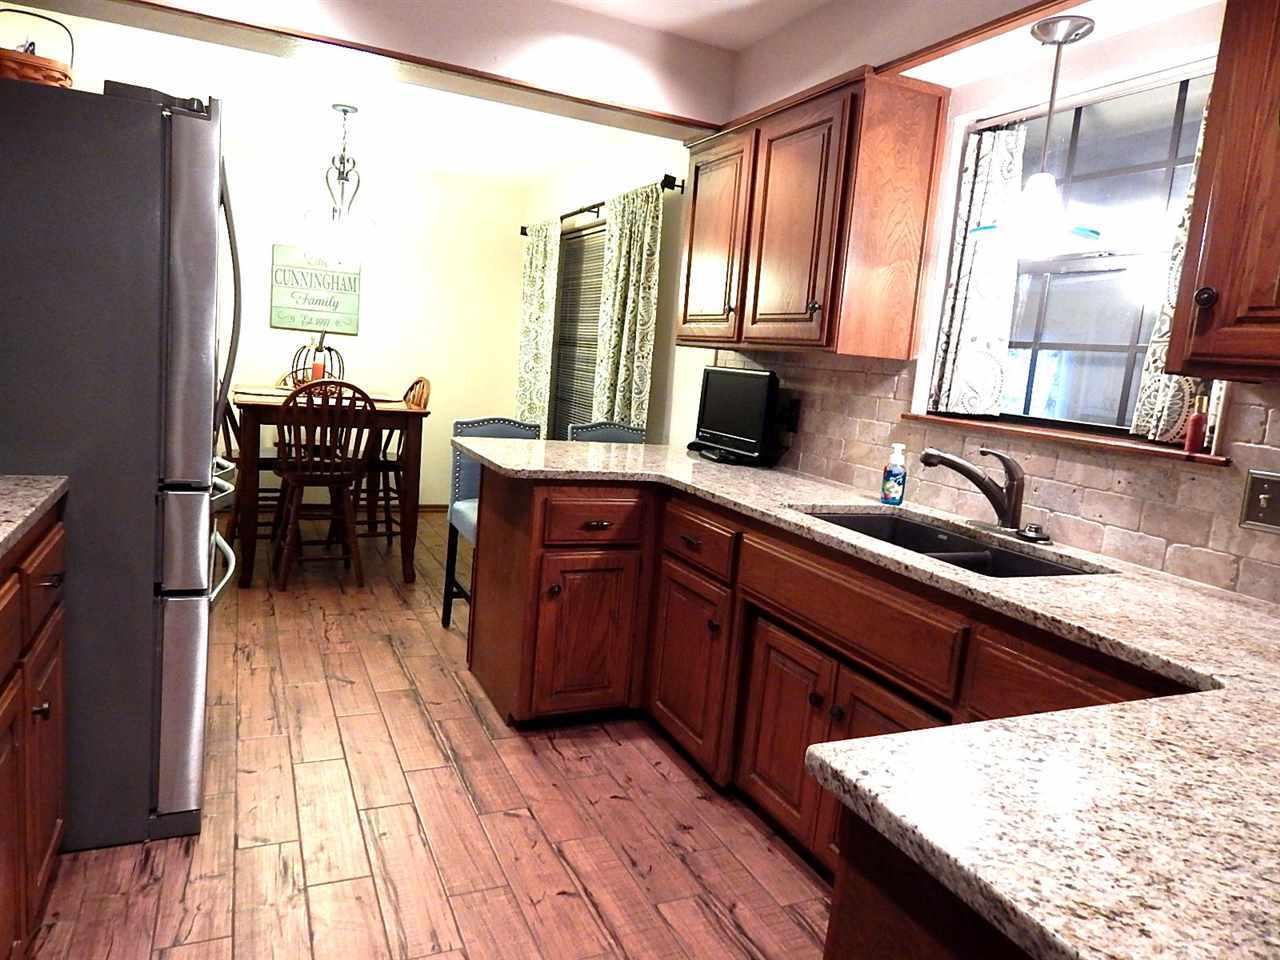 Sold Cross Sale W/ MLS | 2721 Wintergreen Ponca City, OK 74604 9